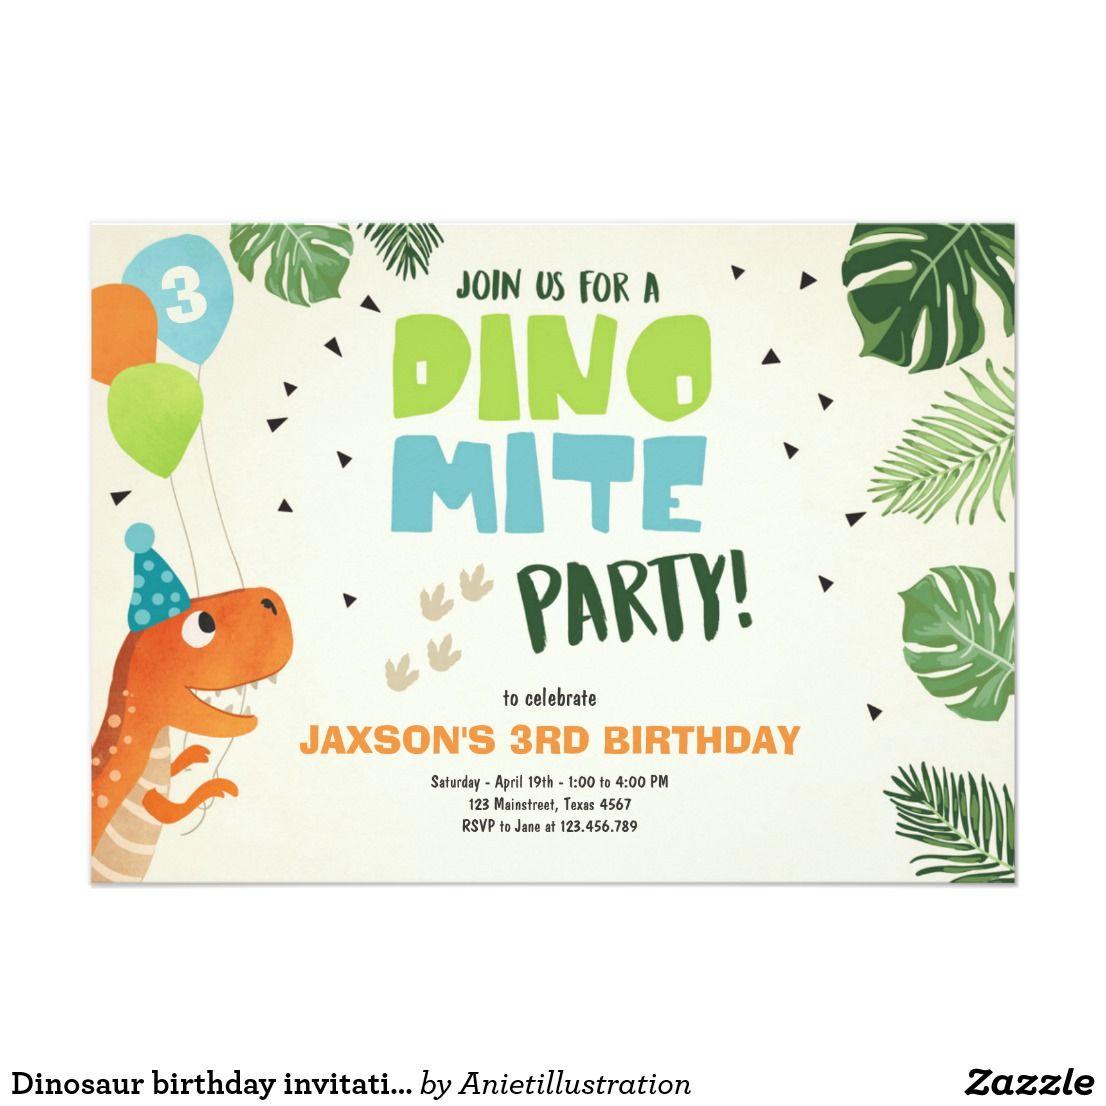 Dinosaur birthday invitation Dino mite T-Rex party | Dino bday ...